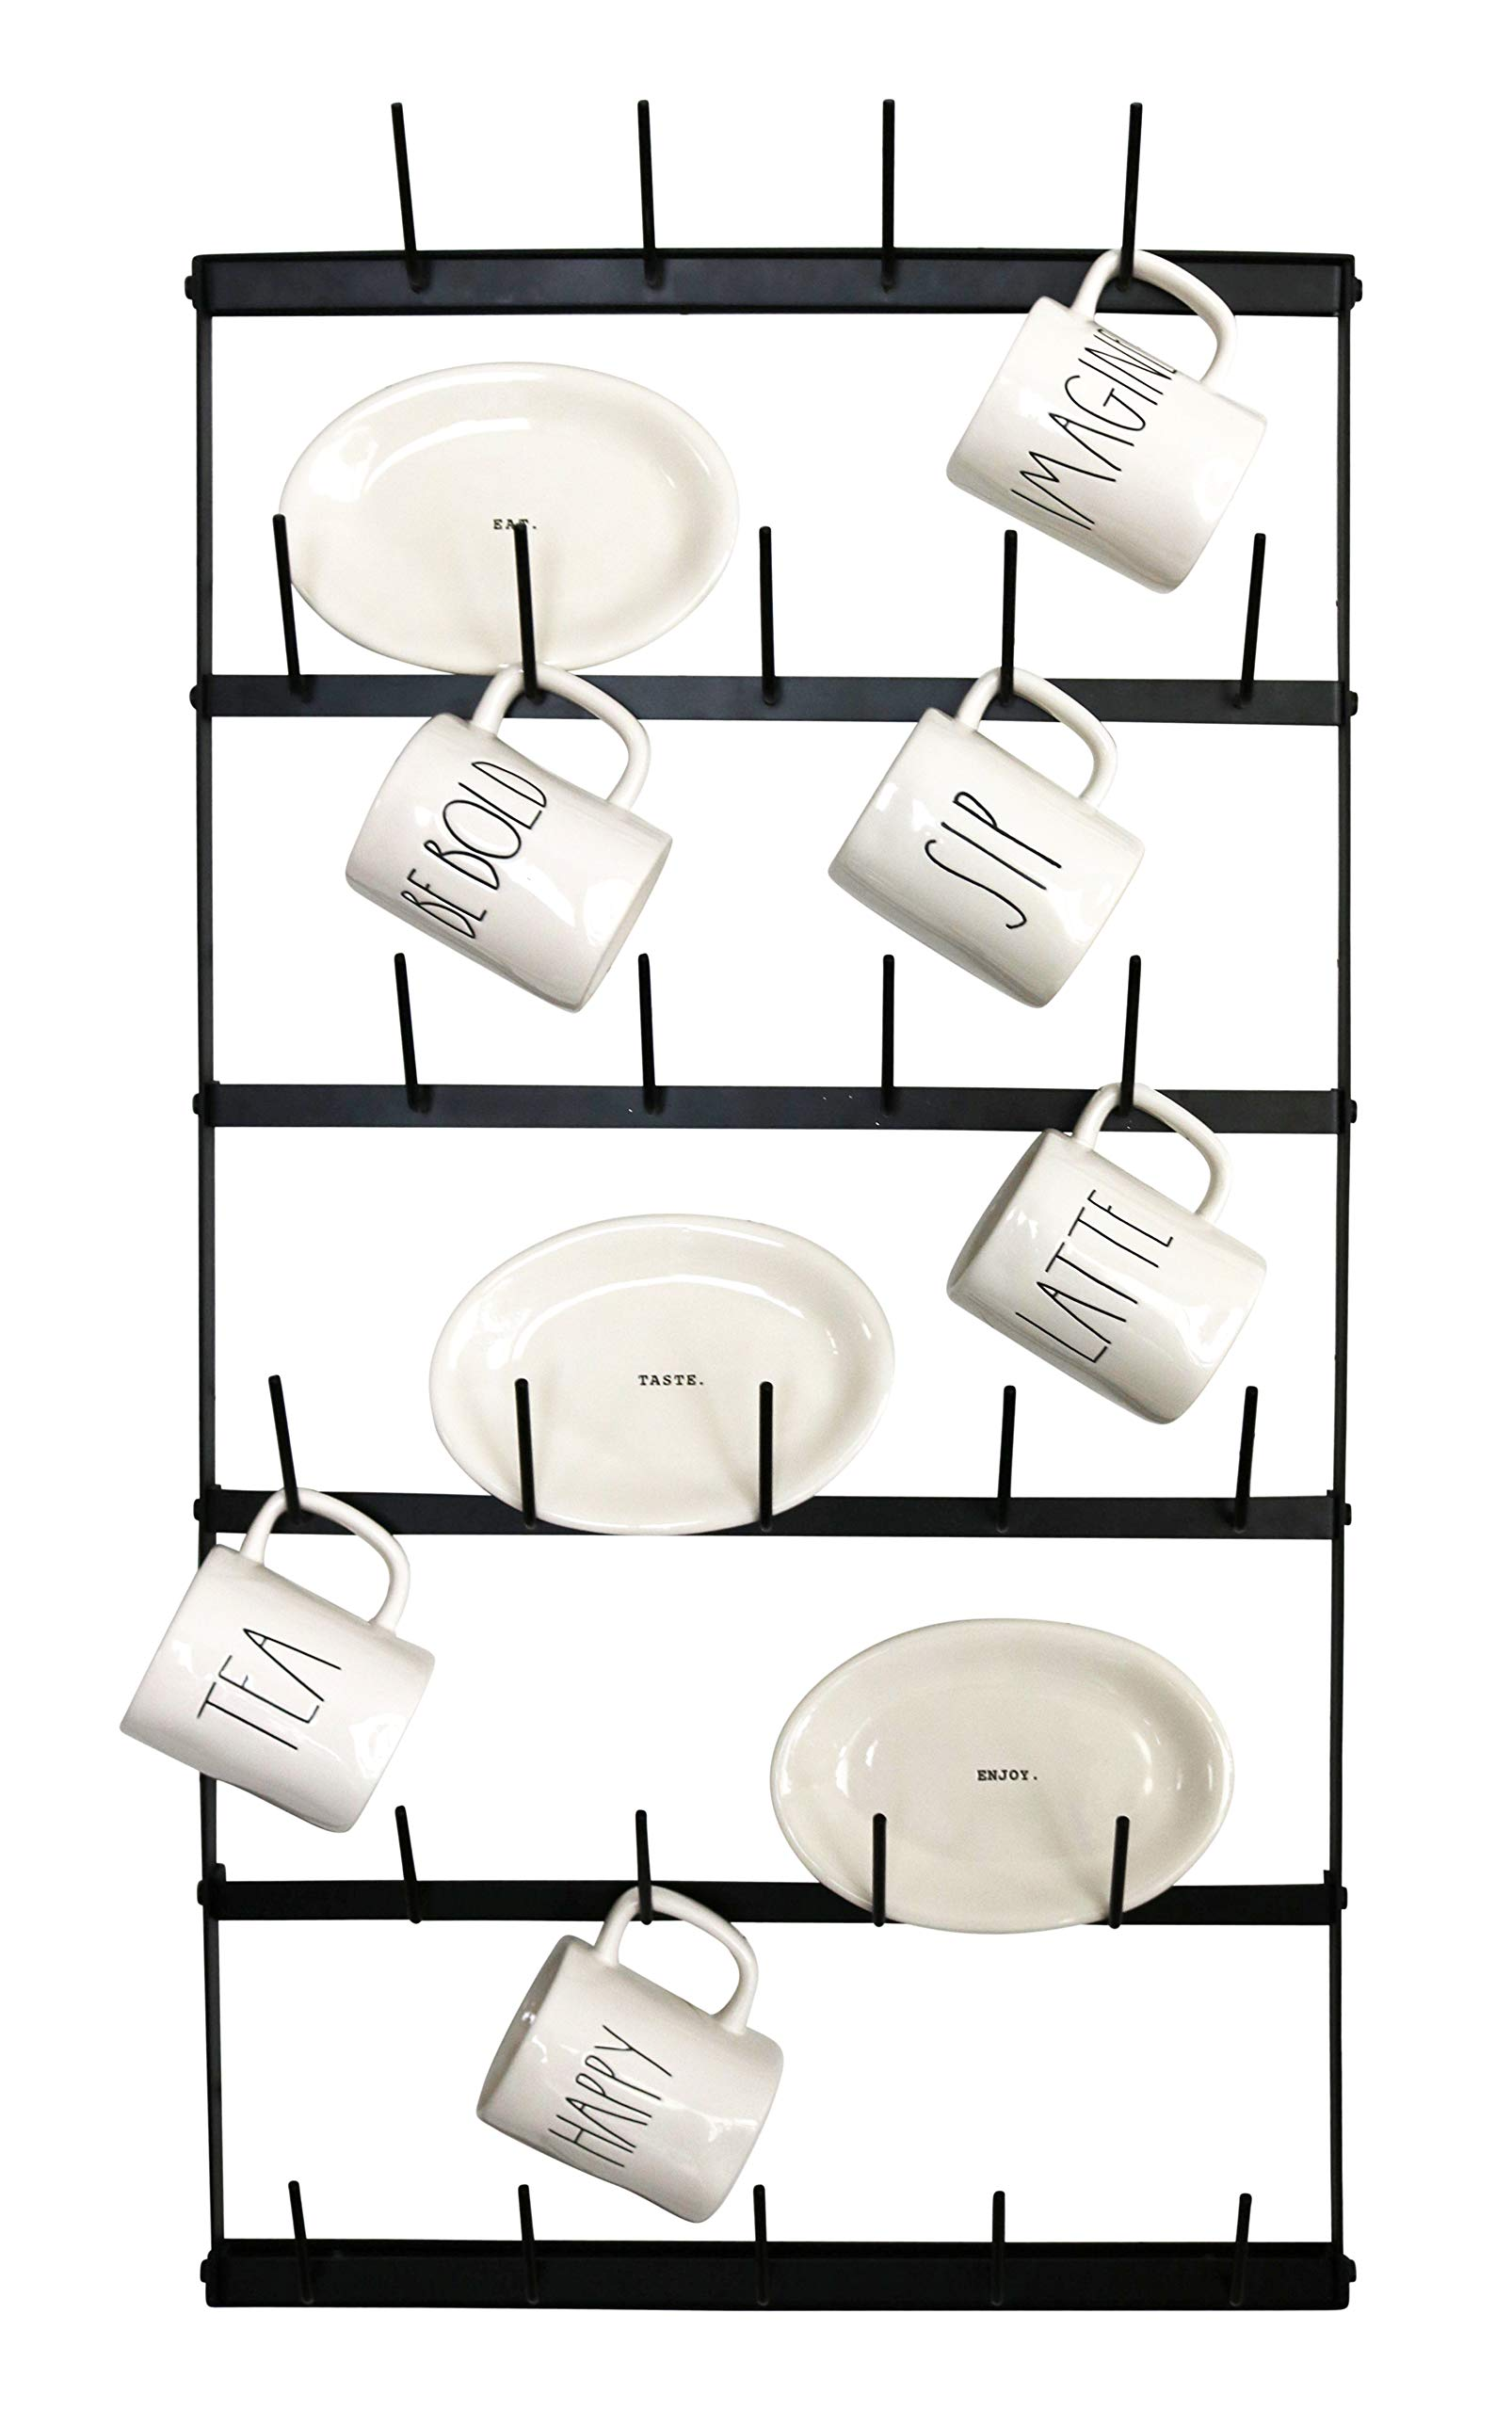 Metal Coffee Mug Rack - Large 6 Row Wall Mounted Storage Display Organizer Rack For Coffee Mugs, Tea Cups, Mason Jars, and More. (38'' x 20.5'' x 3'')